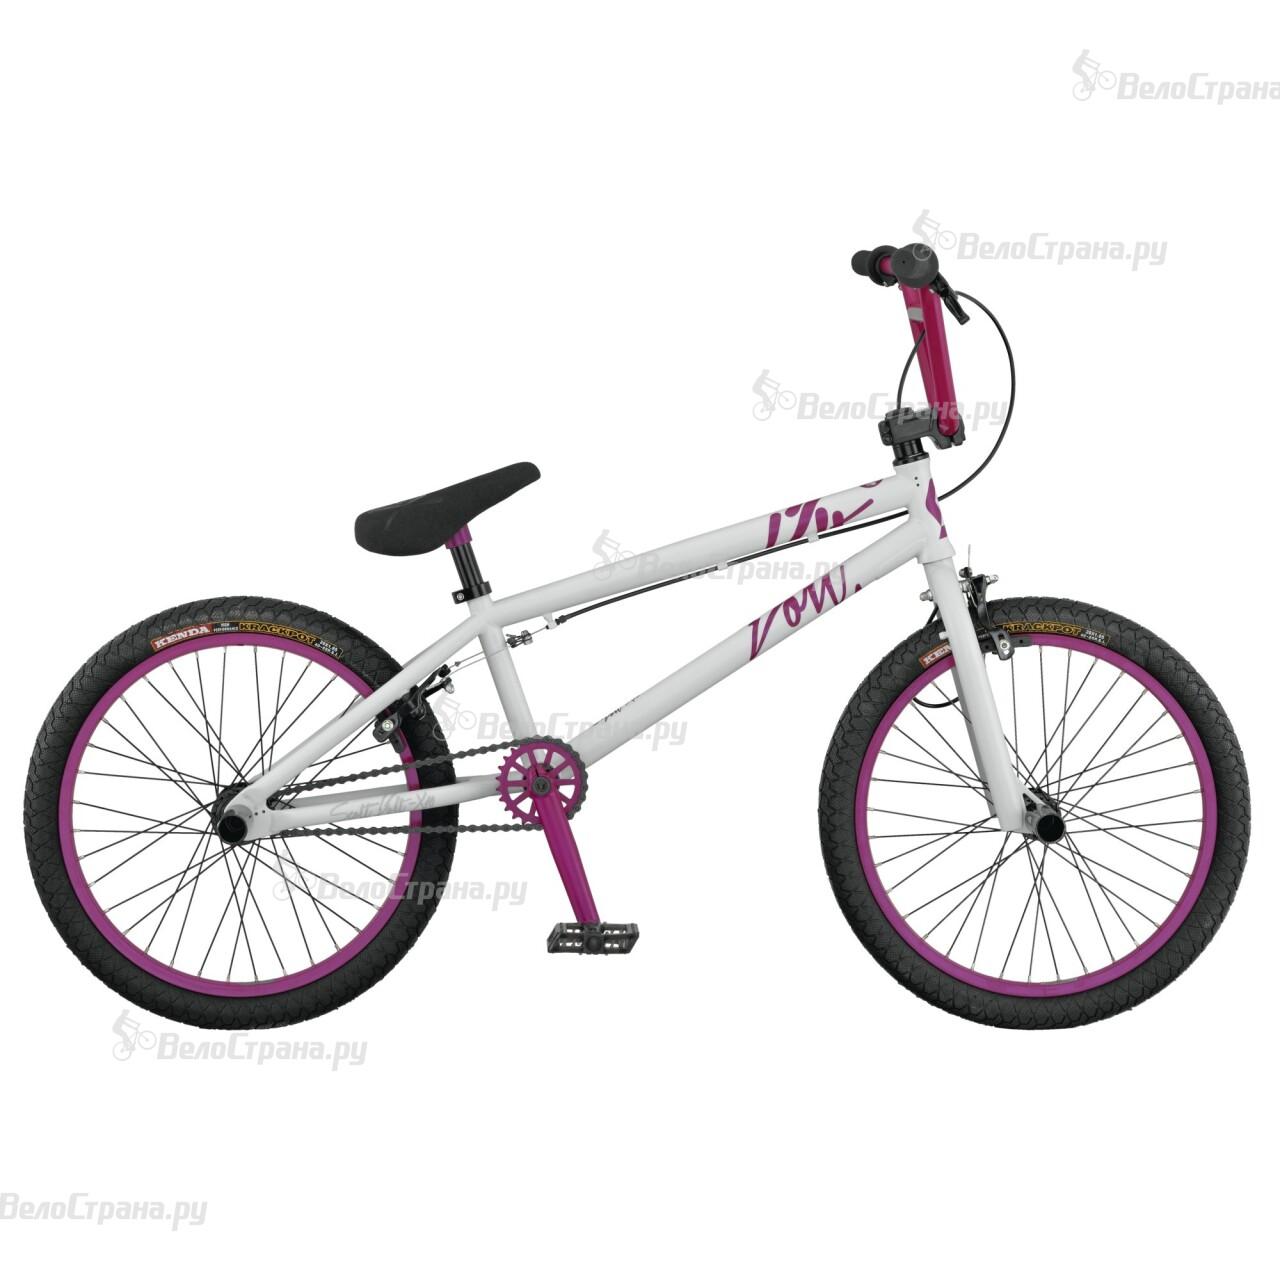 Велосипед Scott Volt-X 10 (2015)